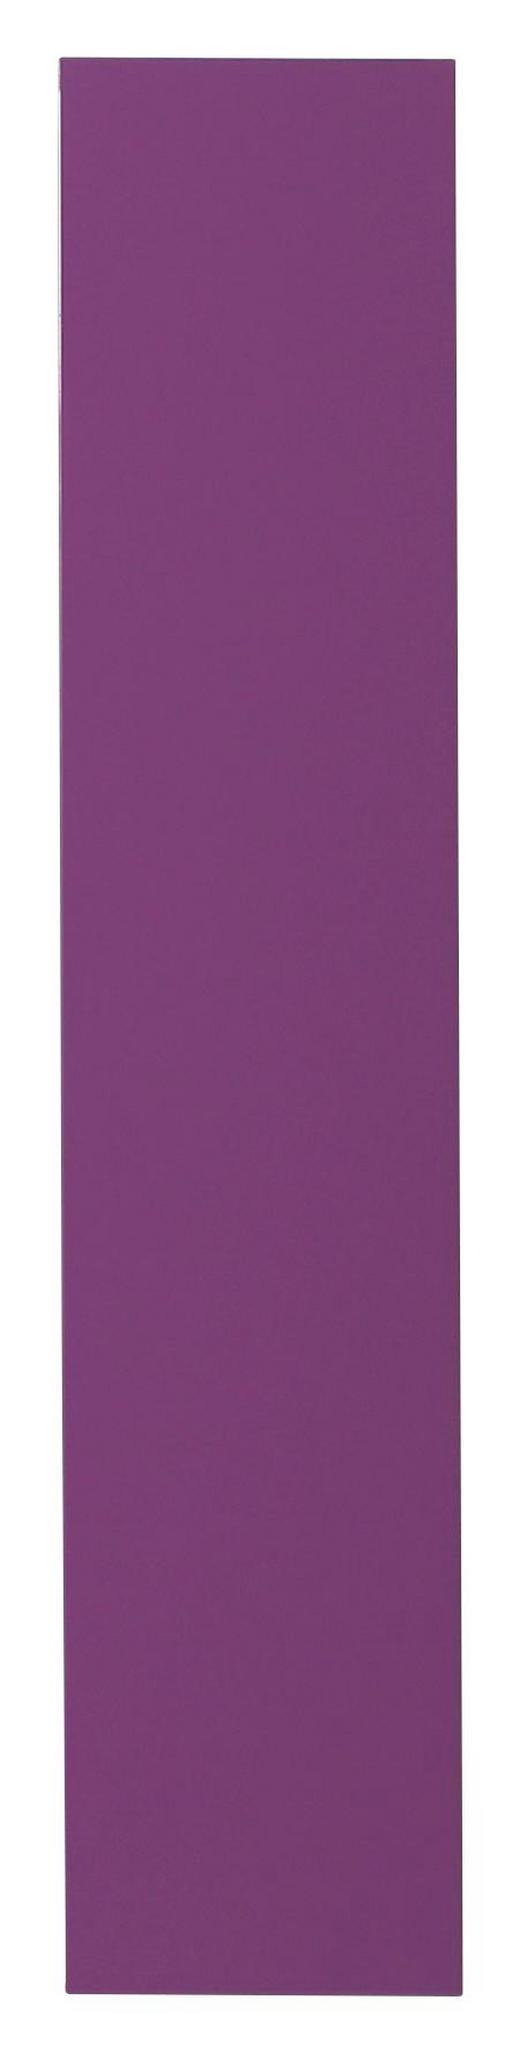 HÄNGEELEMENT Lila - Lila, MODERN, Holz (139/29/31cm) - CARRYHOME